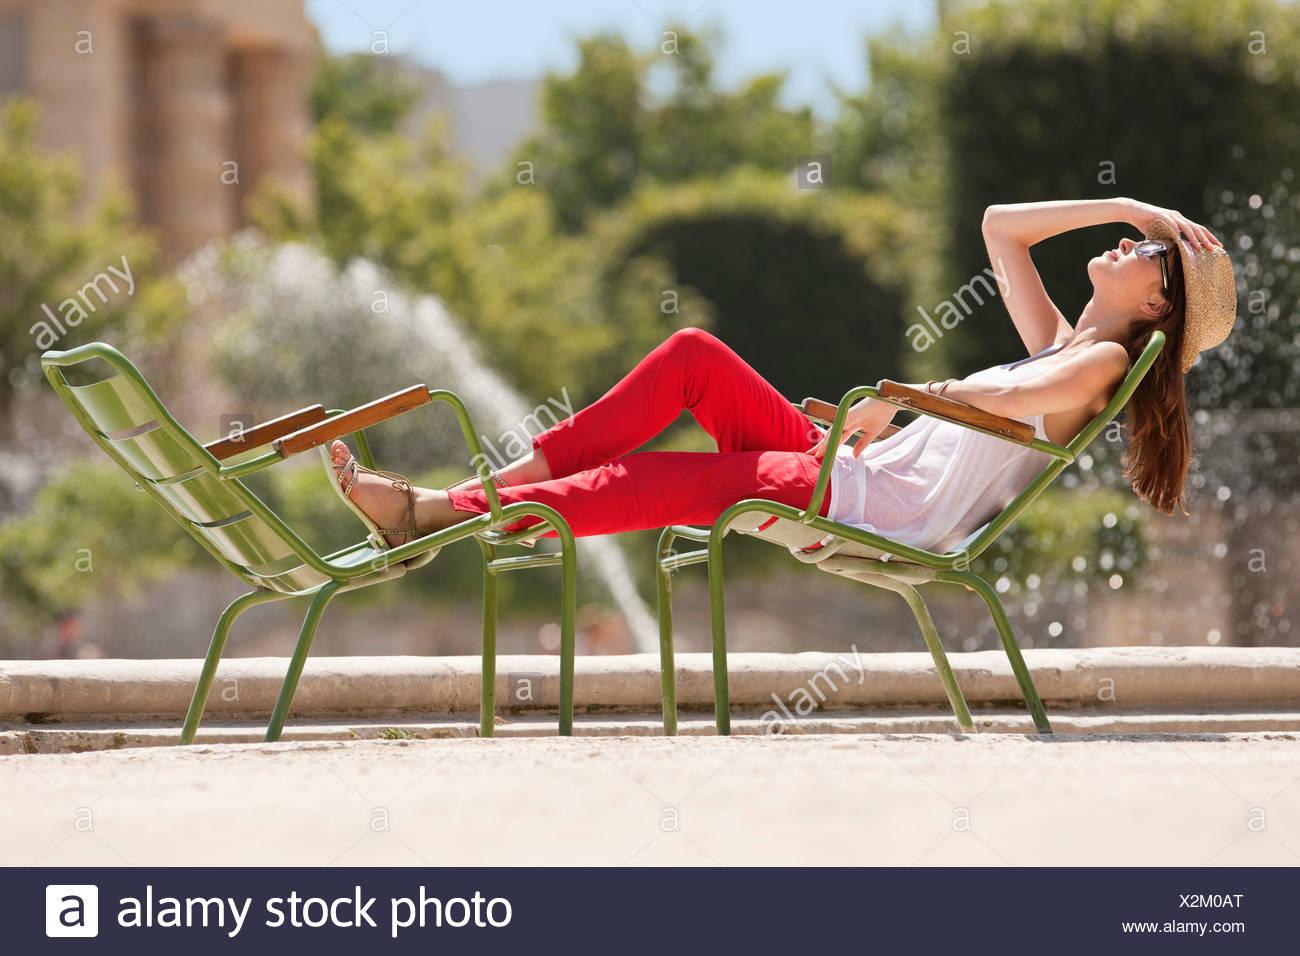 Woman resting in a chair near a pond, Bassin octogonal, Jardin des Tuileries, Paris, Ile-de-France, France - Stock Image